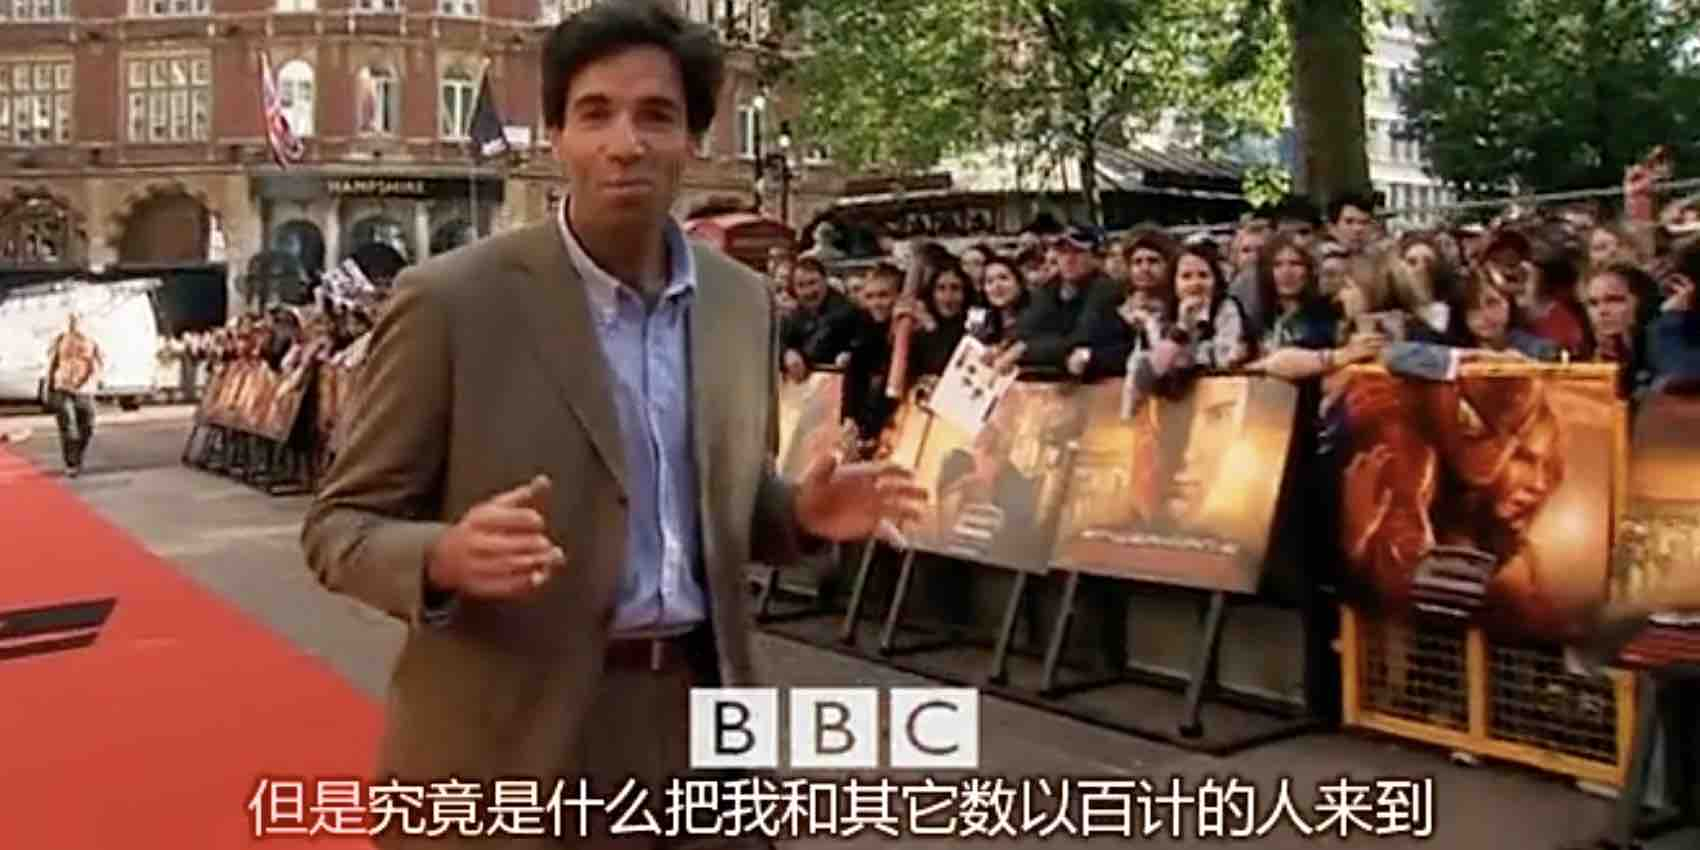 BBC之艺术创造世界:电影的古老基因